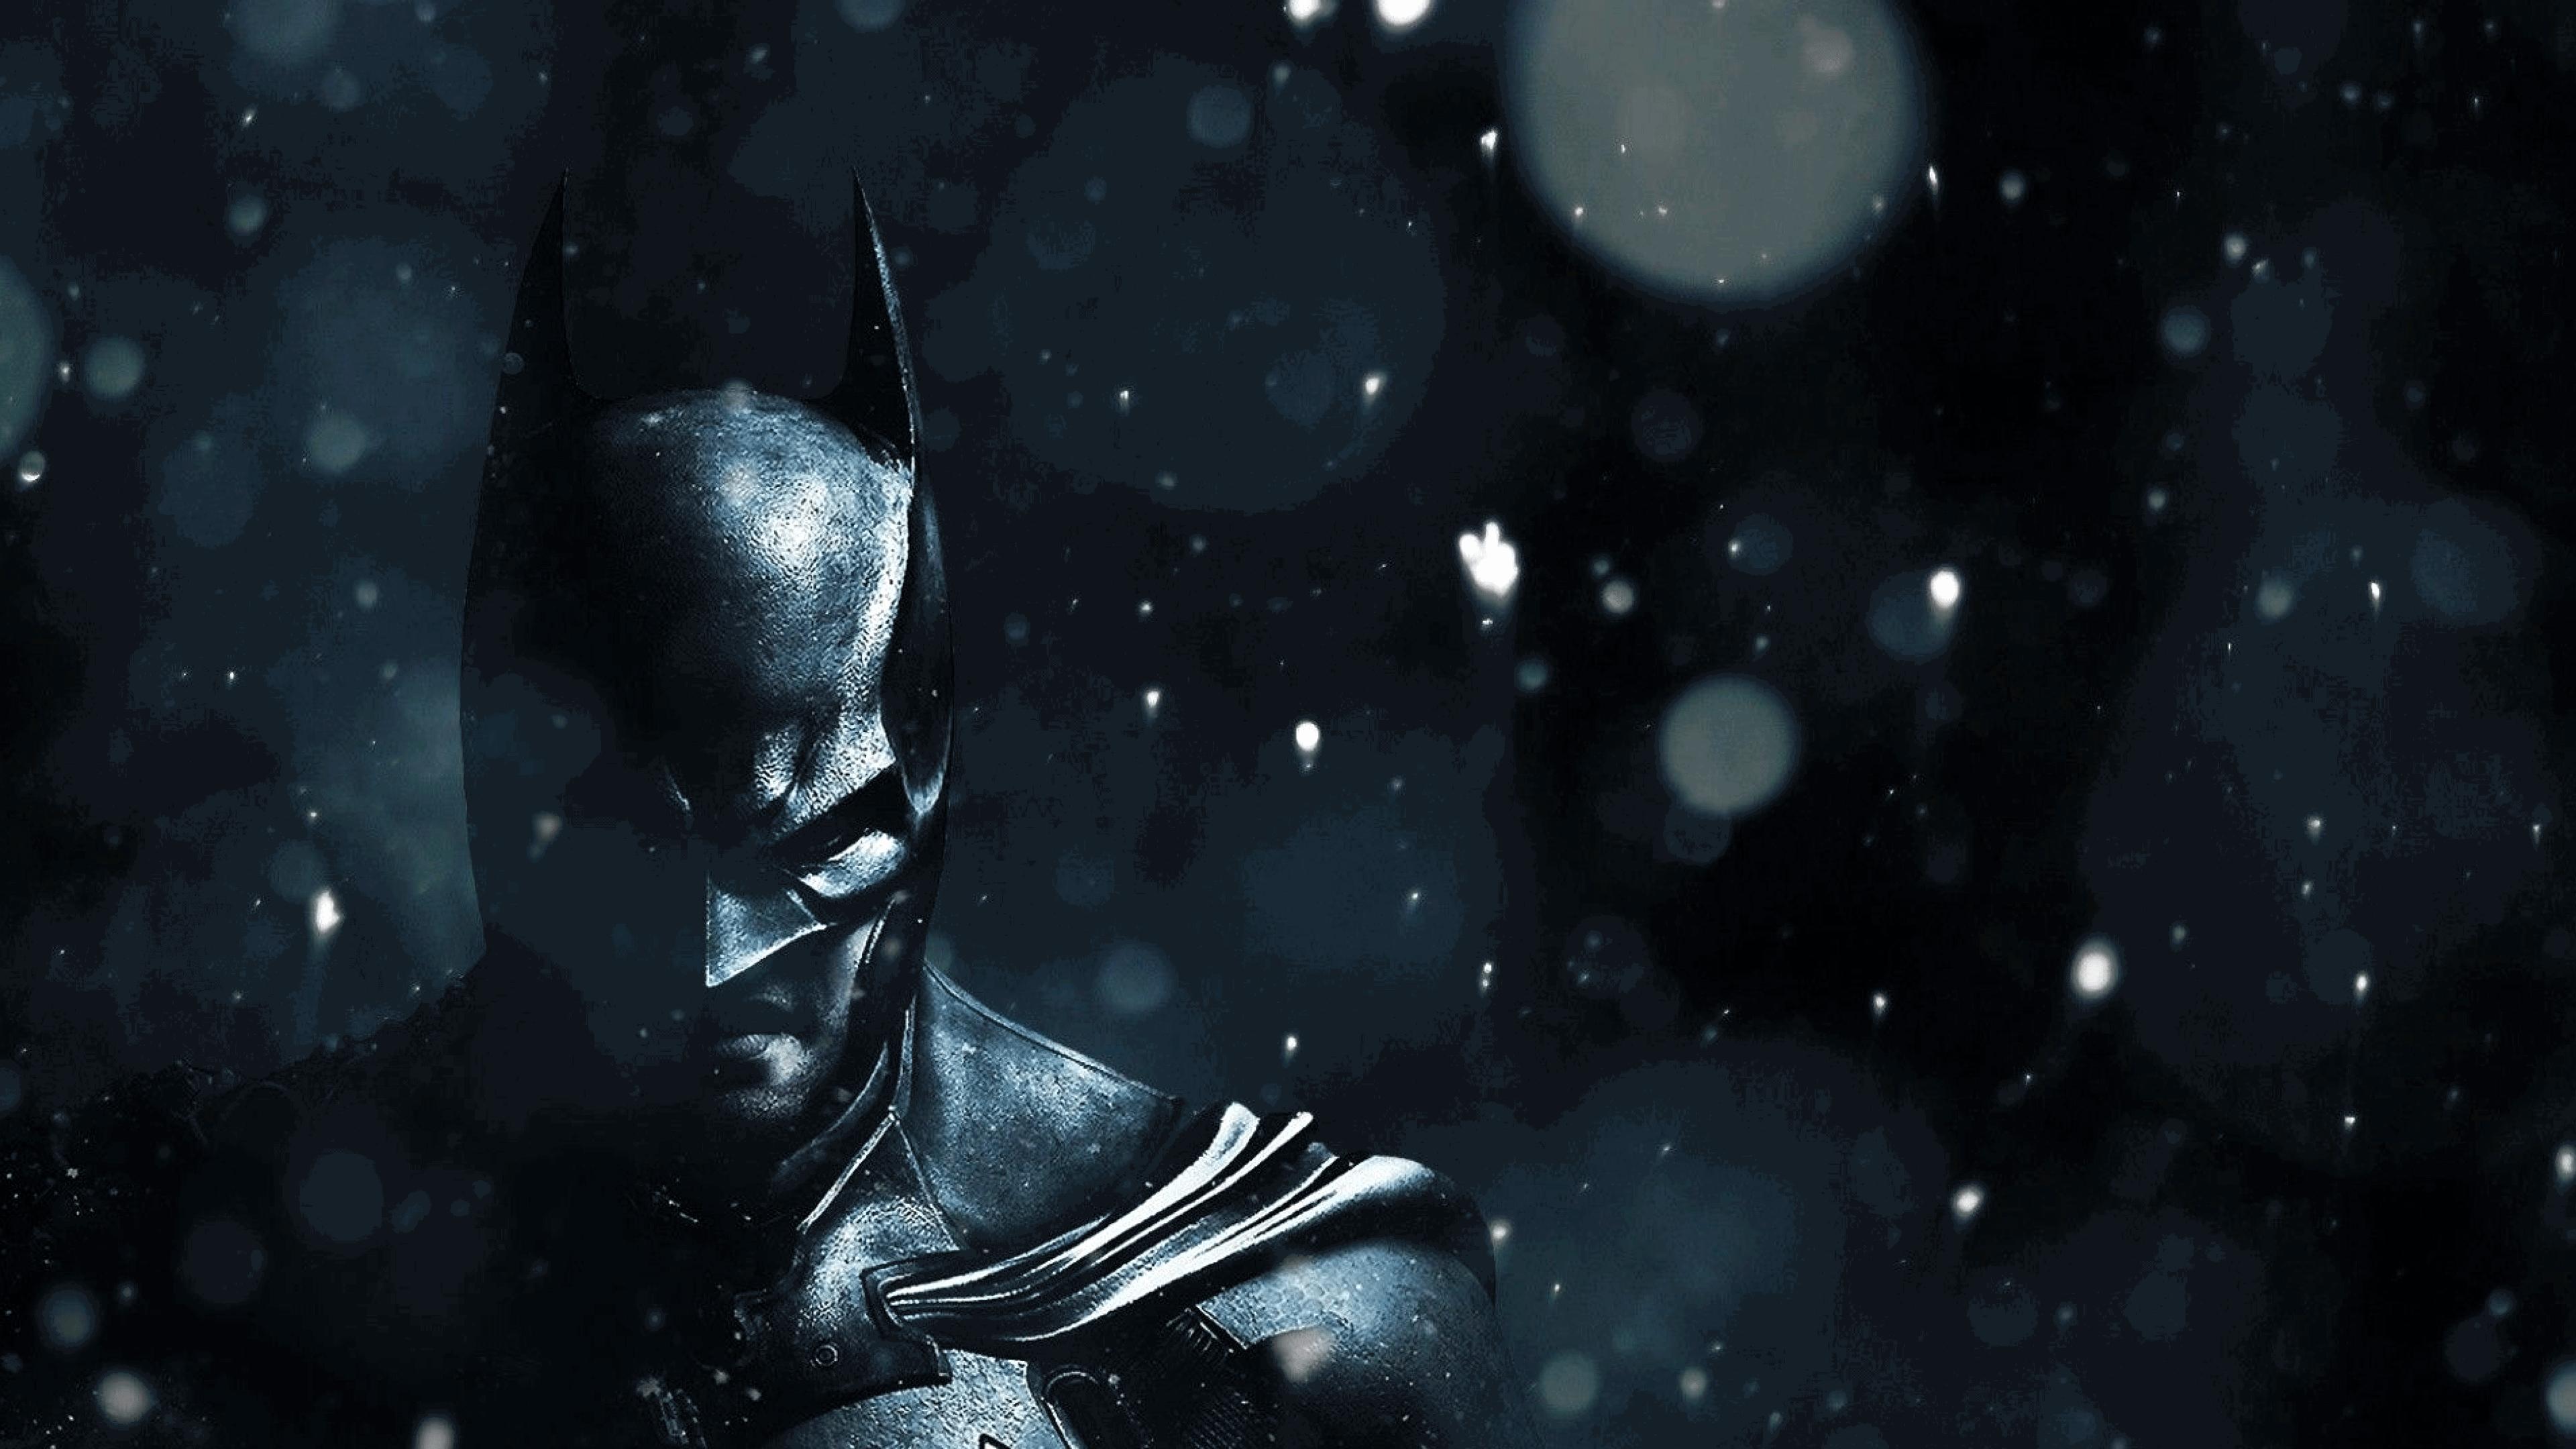 Batman Hd Wallpaper 4k Pc Gallery In 2020 Dc Comics Wallpaper Batman Wallpaper Batman